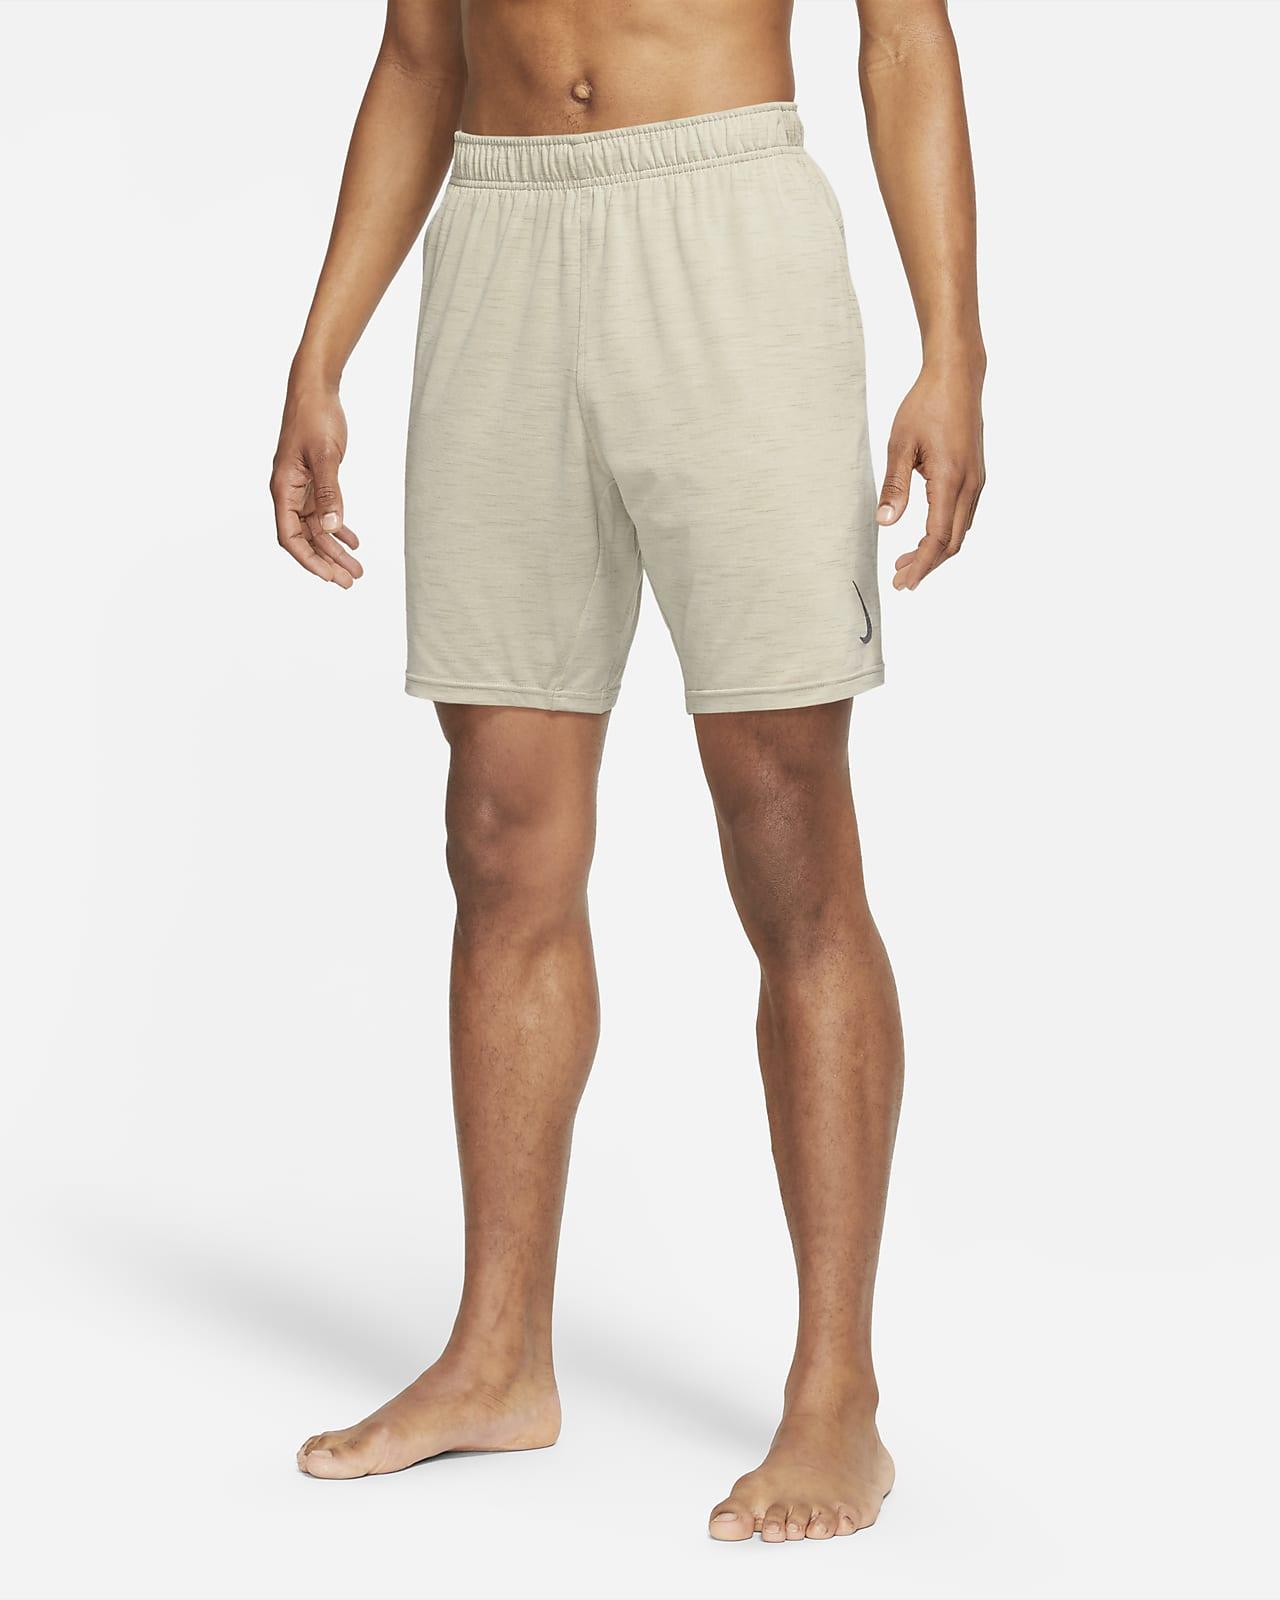 Shorts Nike Yoga Dri-FIT för män